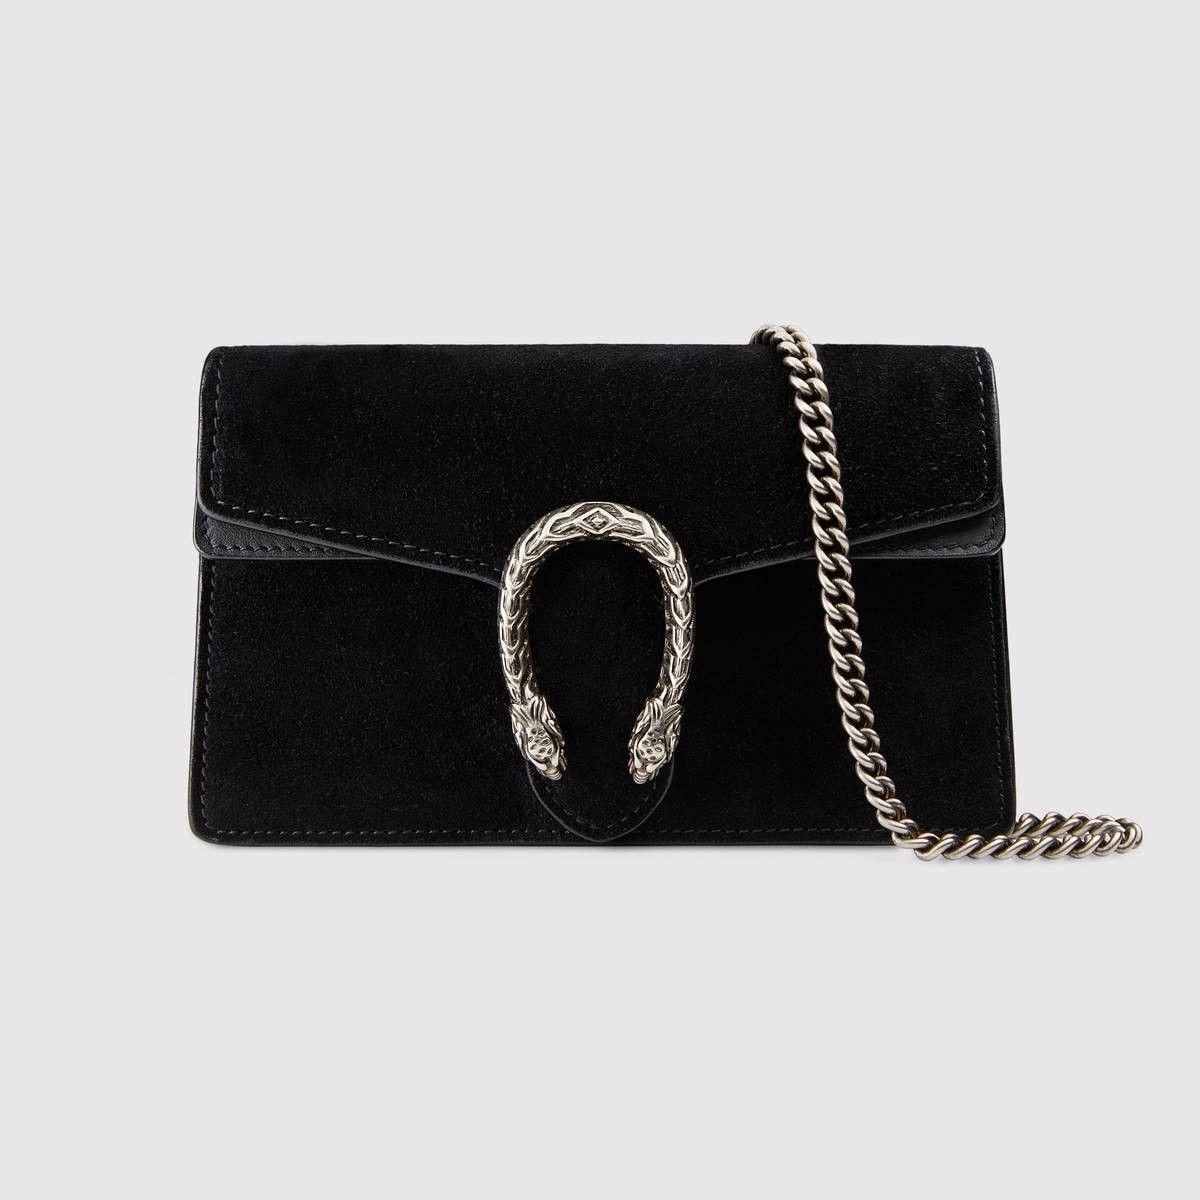 5581725adb8 GUCCI Dionysus Suede Super Mini Bag - Black Suede.  gucci  bags  shoulder  bags  crystal  stone  velvet  suede